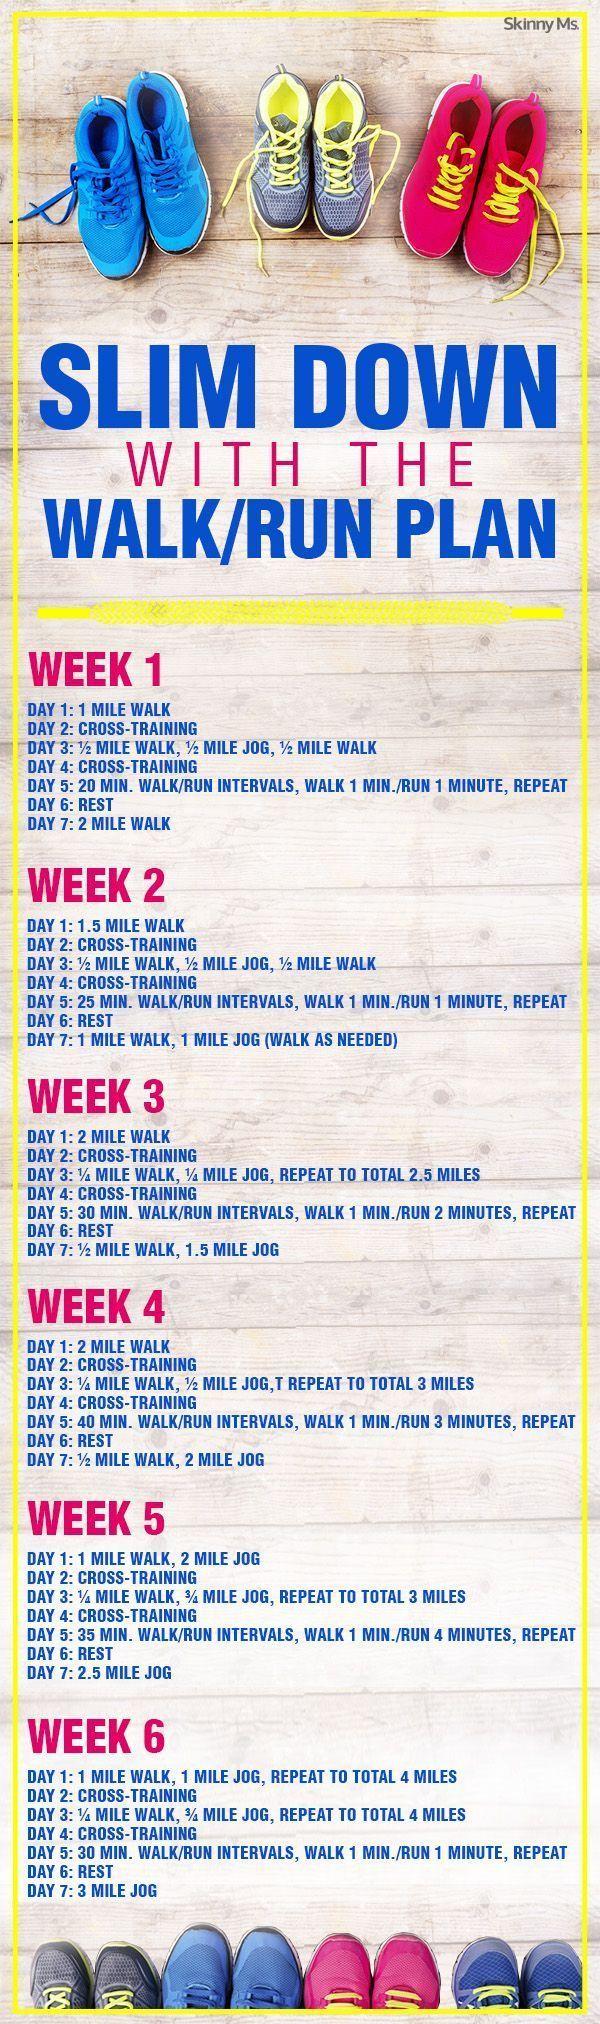 Slim Down with the Walk/Run Plan!  #walkrunplan #running